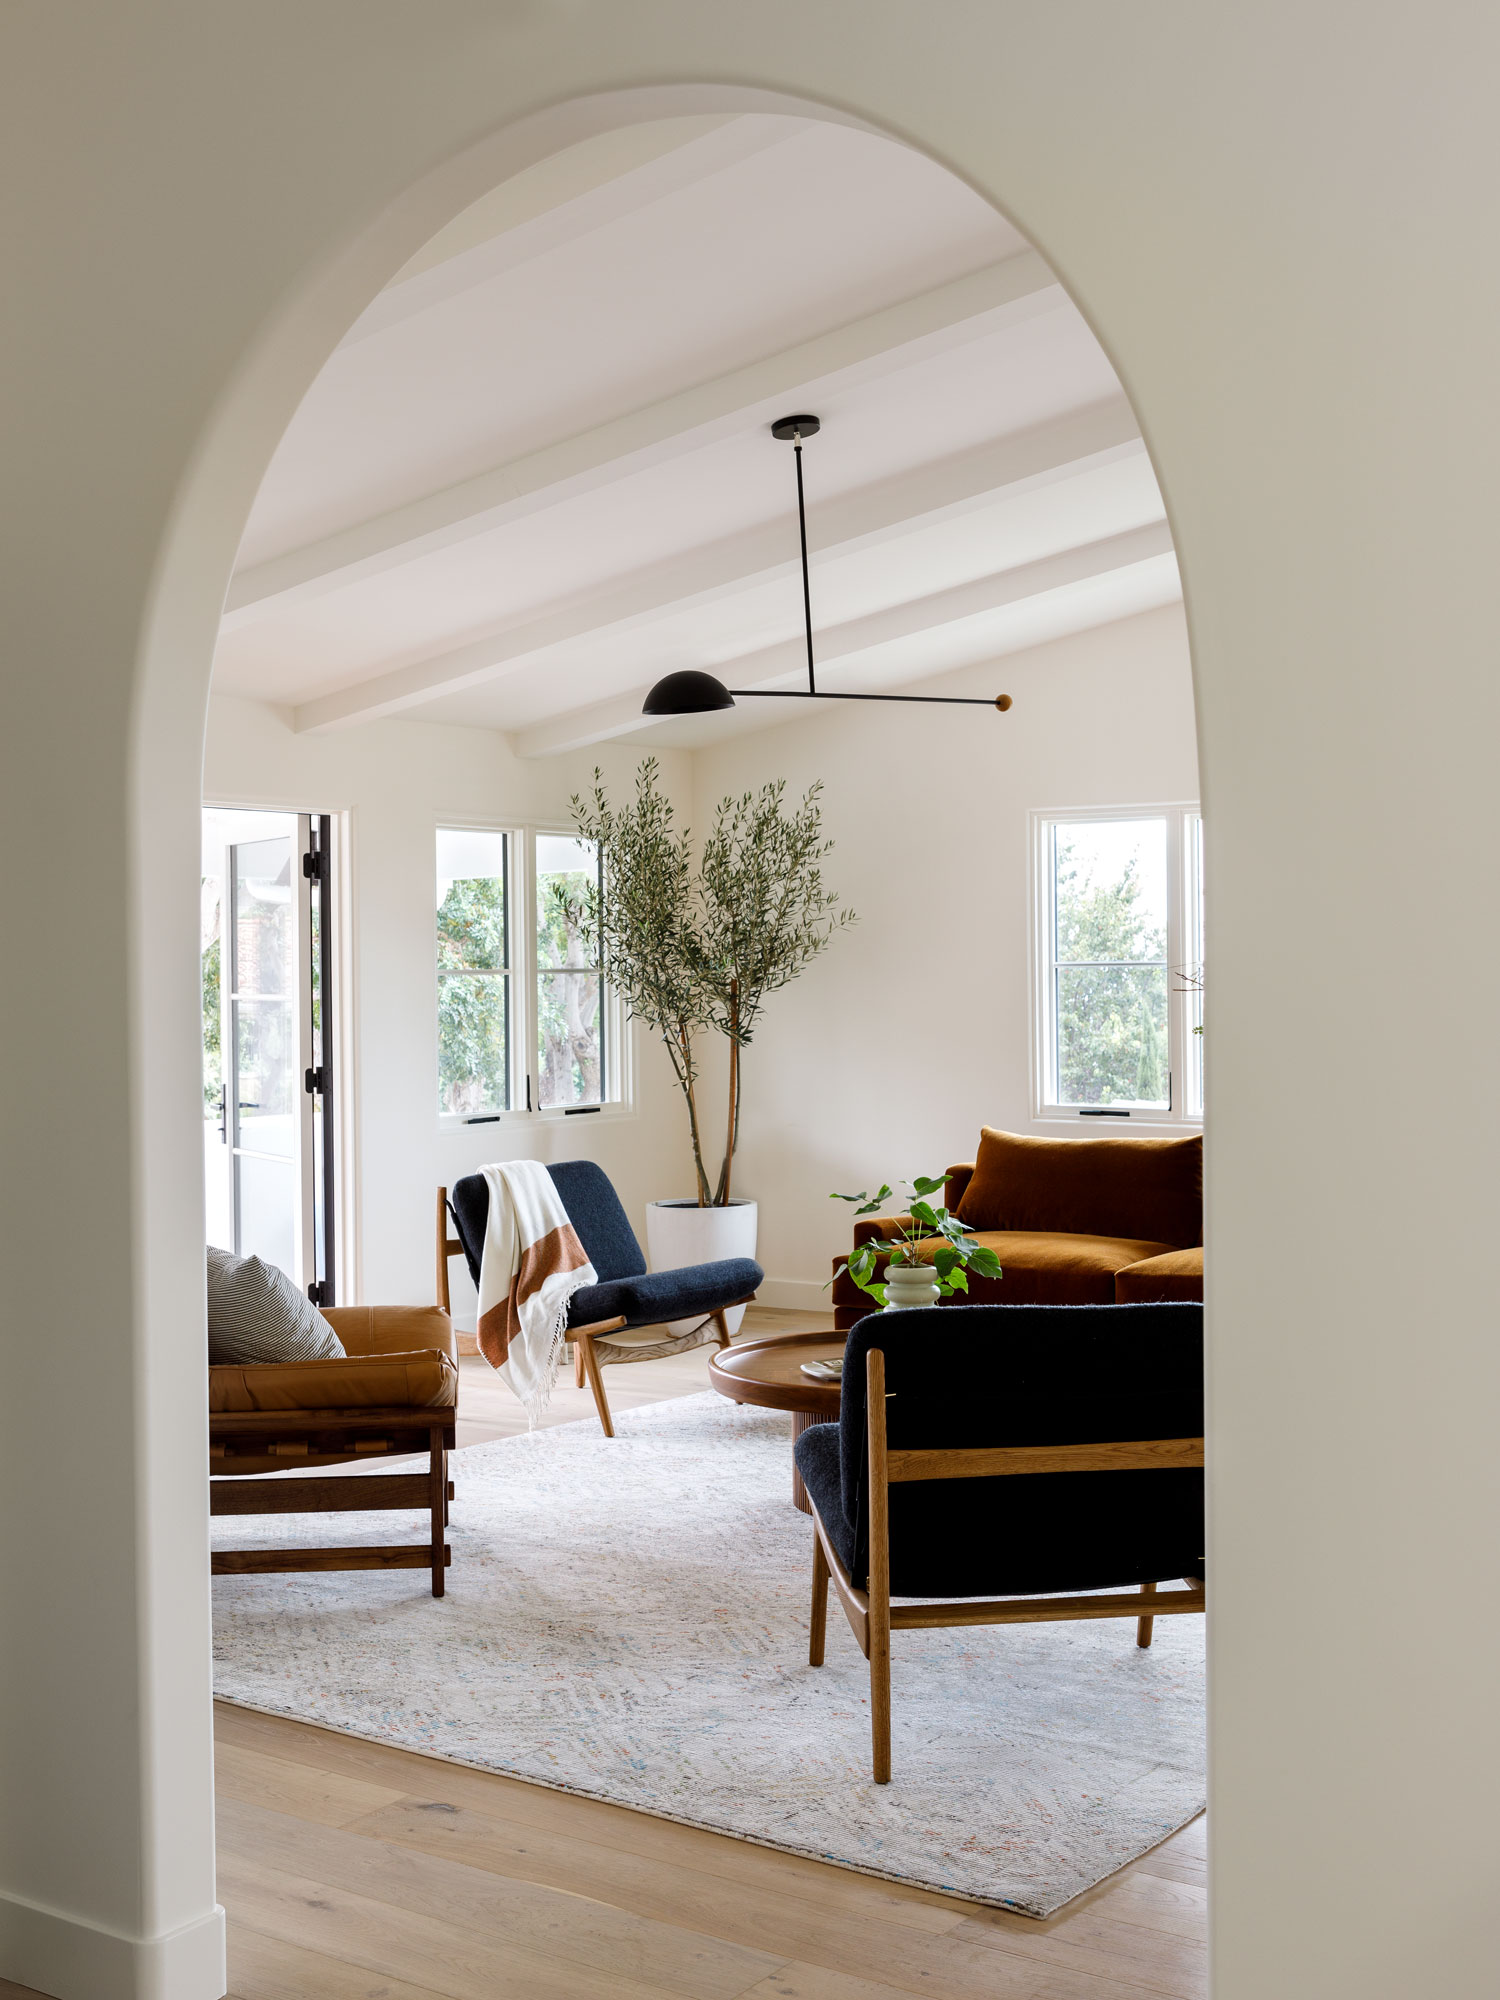 La Fortuna Residence La Home Beatriz Rose Byrdesign Photo Laure Joliet Yellowtrace 04